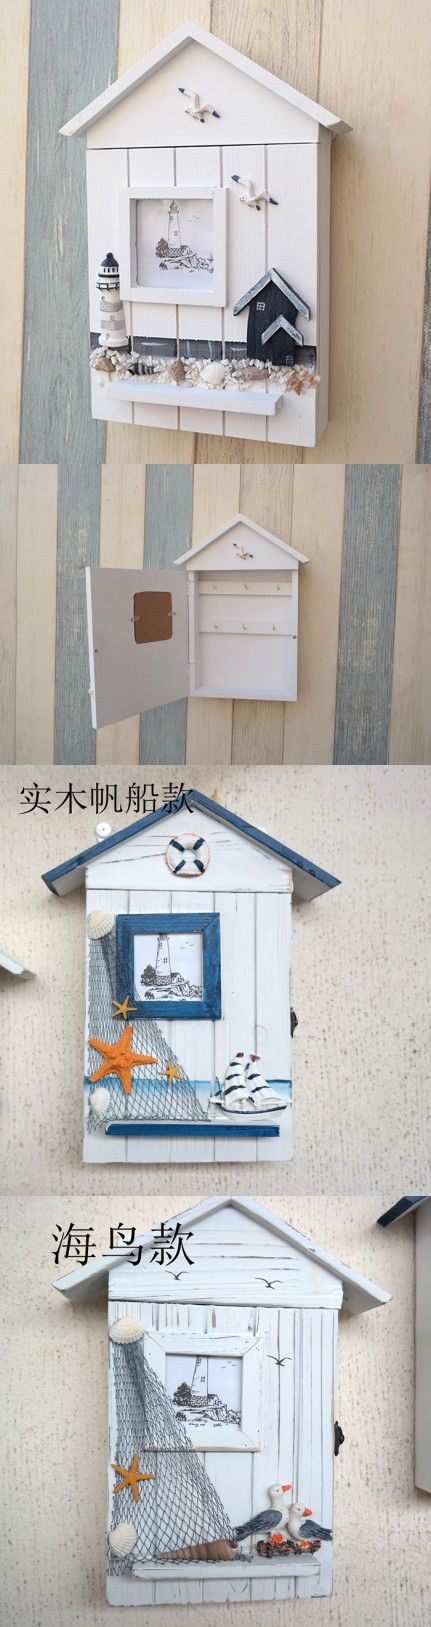 Free shipping Mediterranean style key box Home Furnishing marine wind creative wooden crafts decorative wall box $33.2